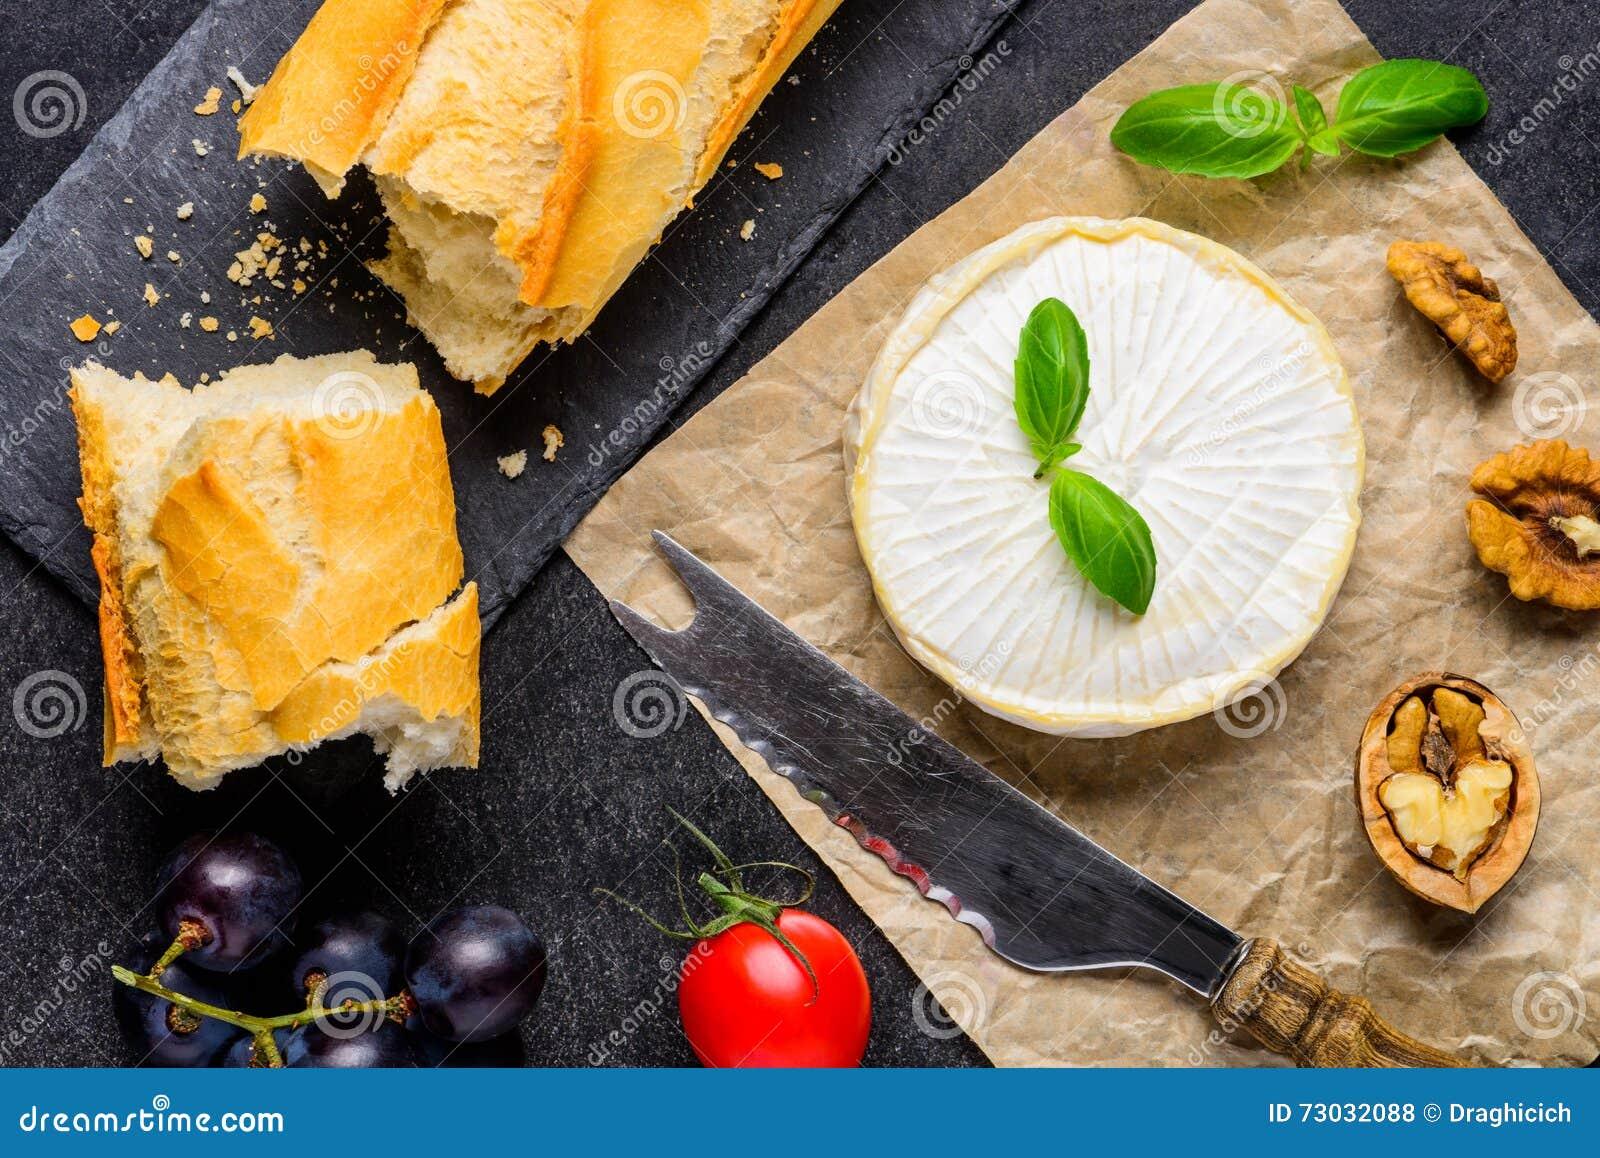 Сыр бри с французским хлебом